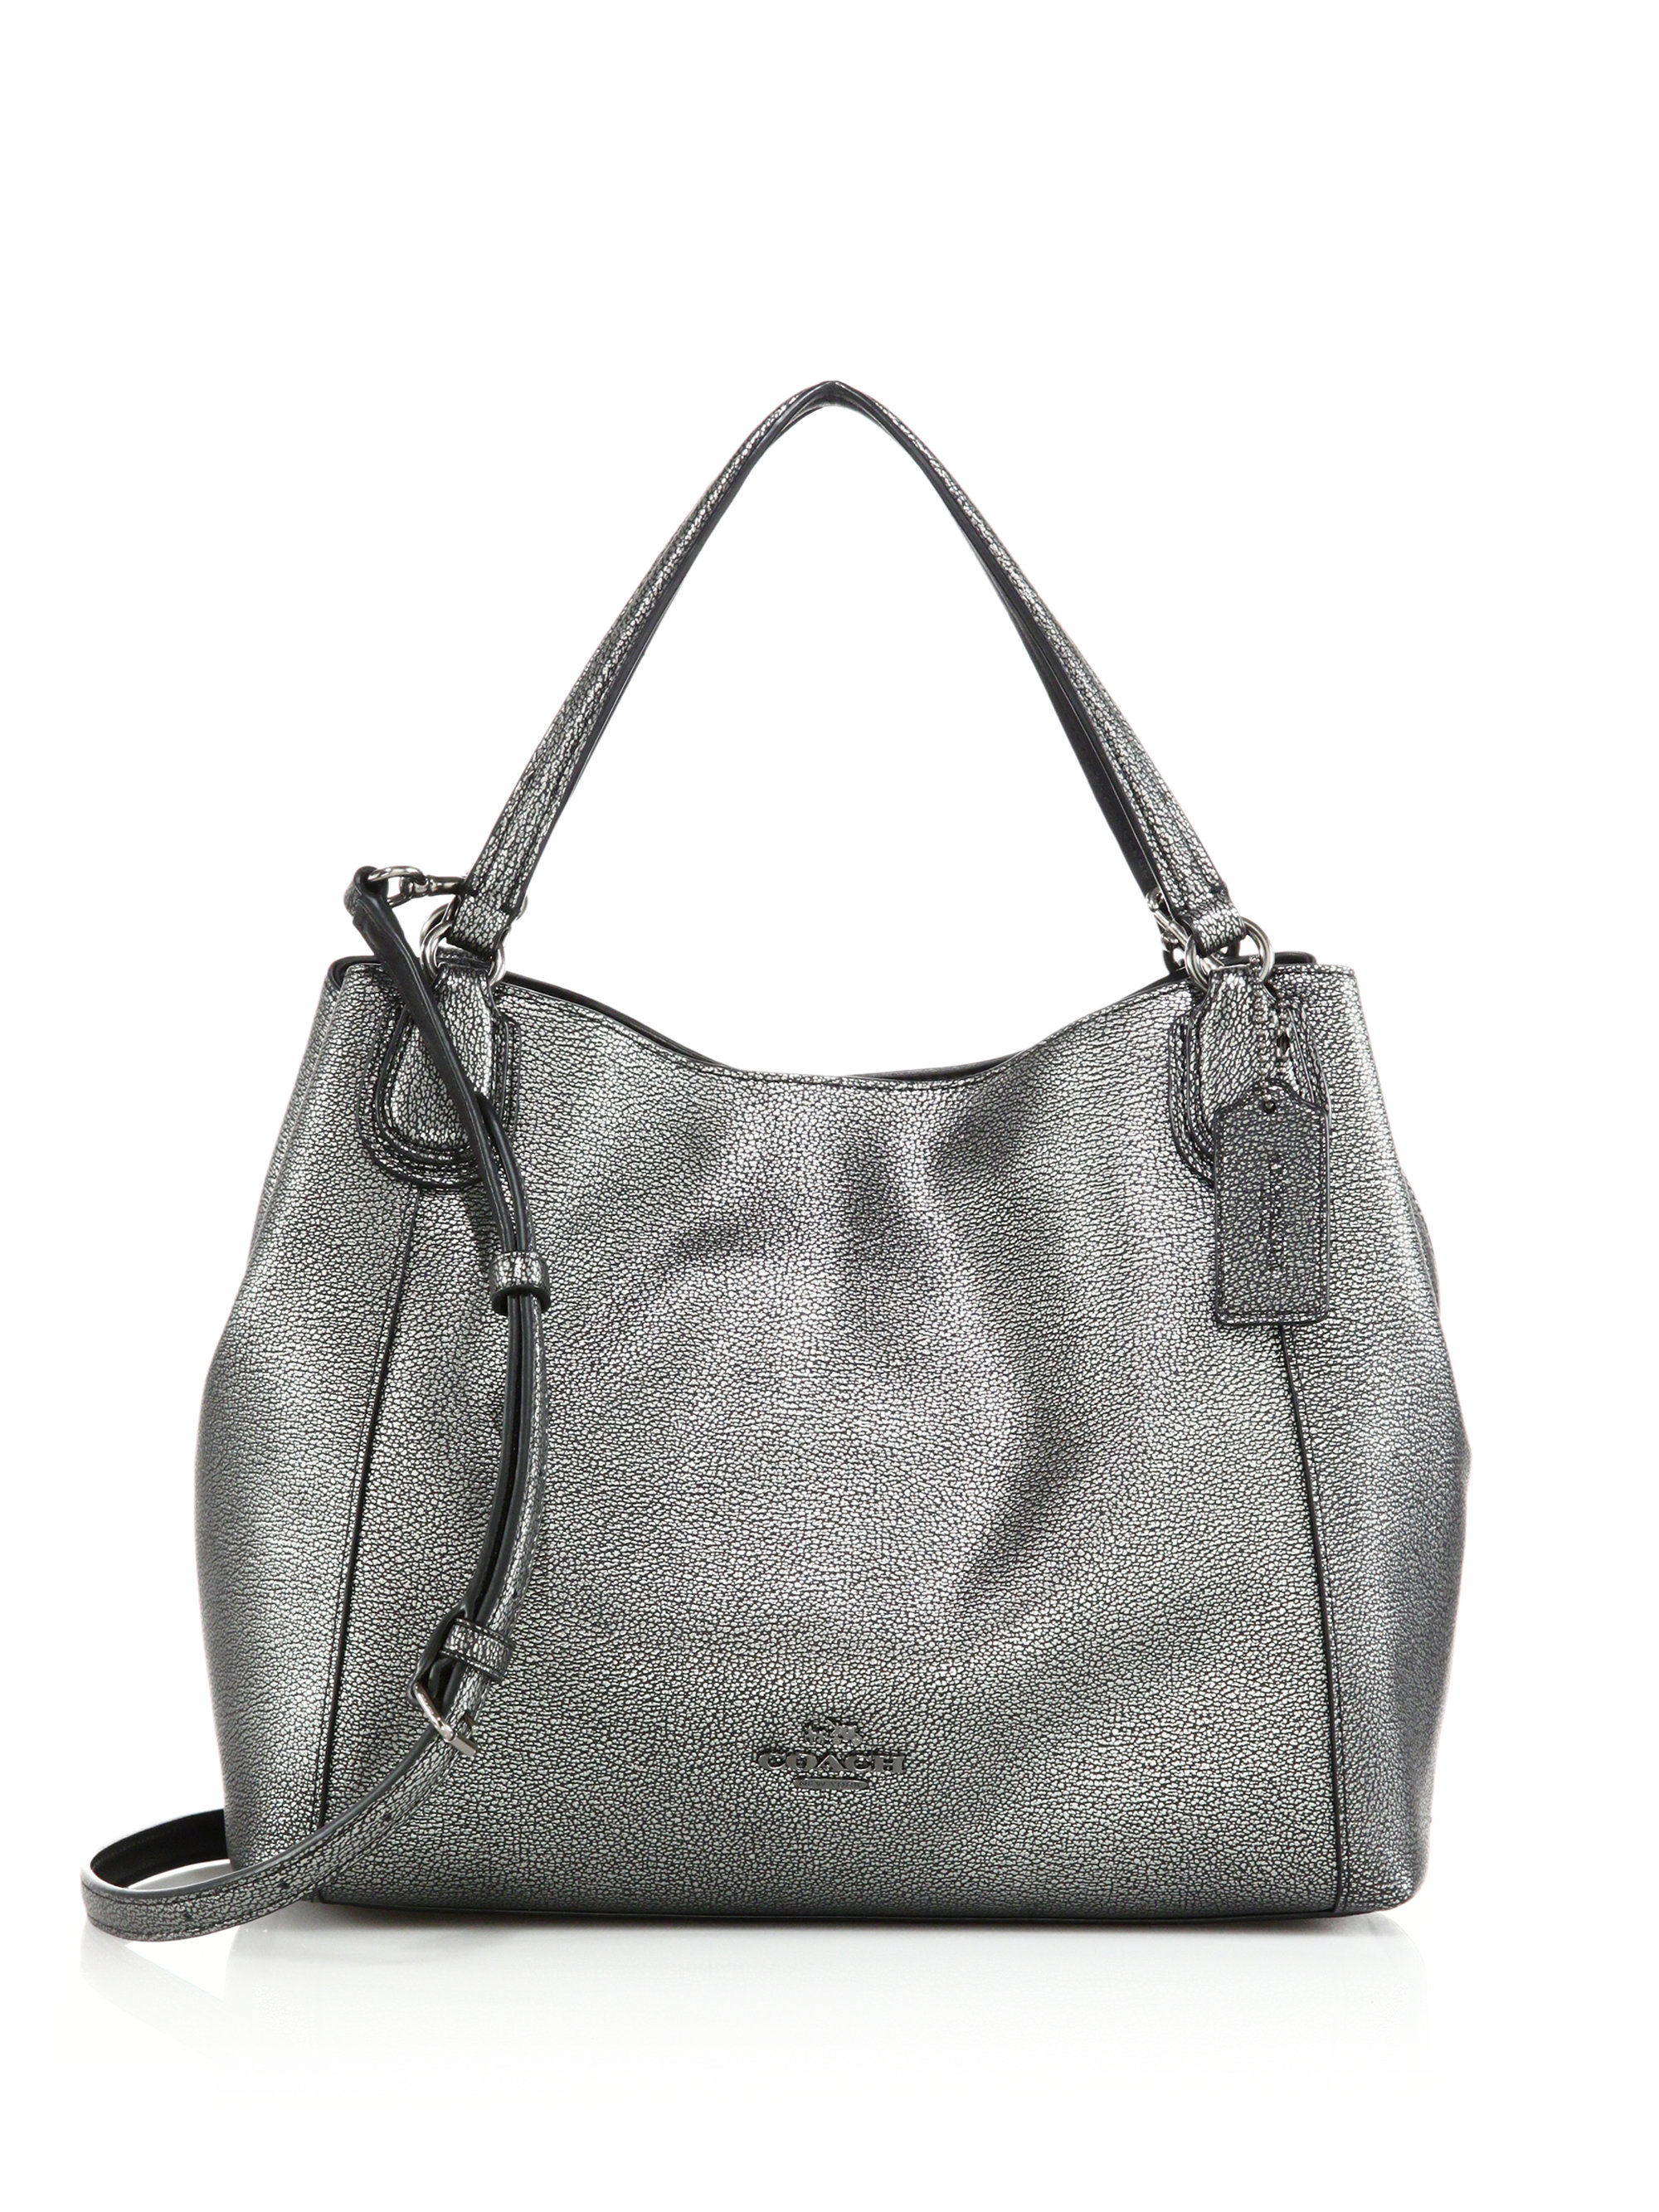 Lyst - COACH Edie Metallic Pebbled Leather Shoulder Bag in Metallic bf4030527d